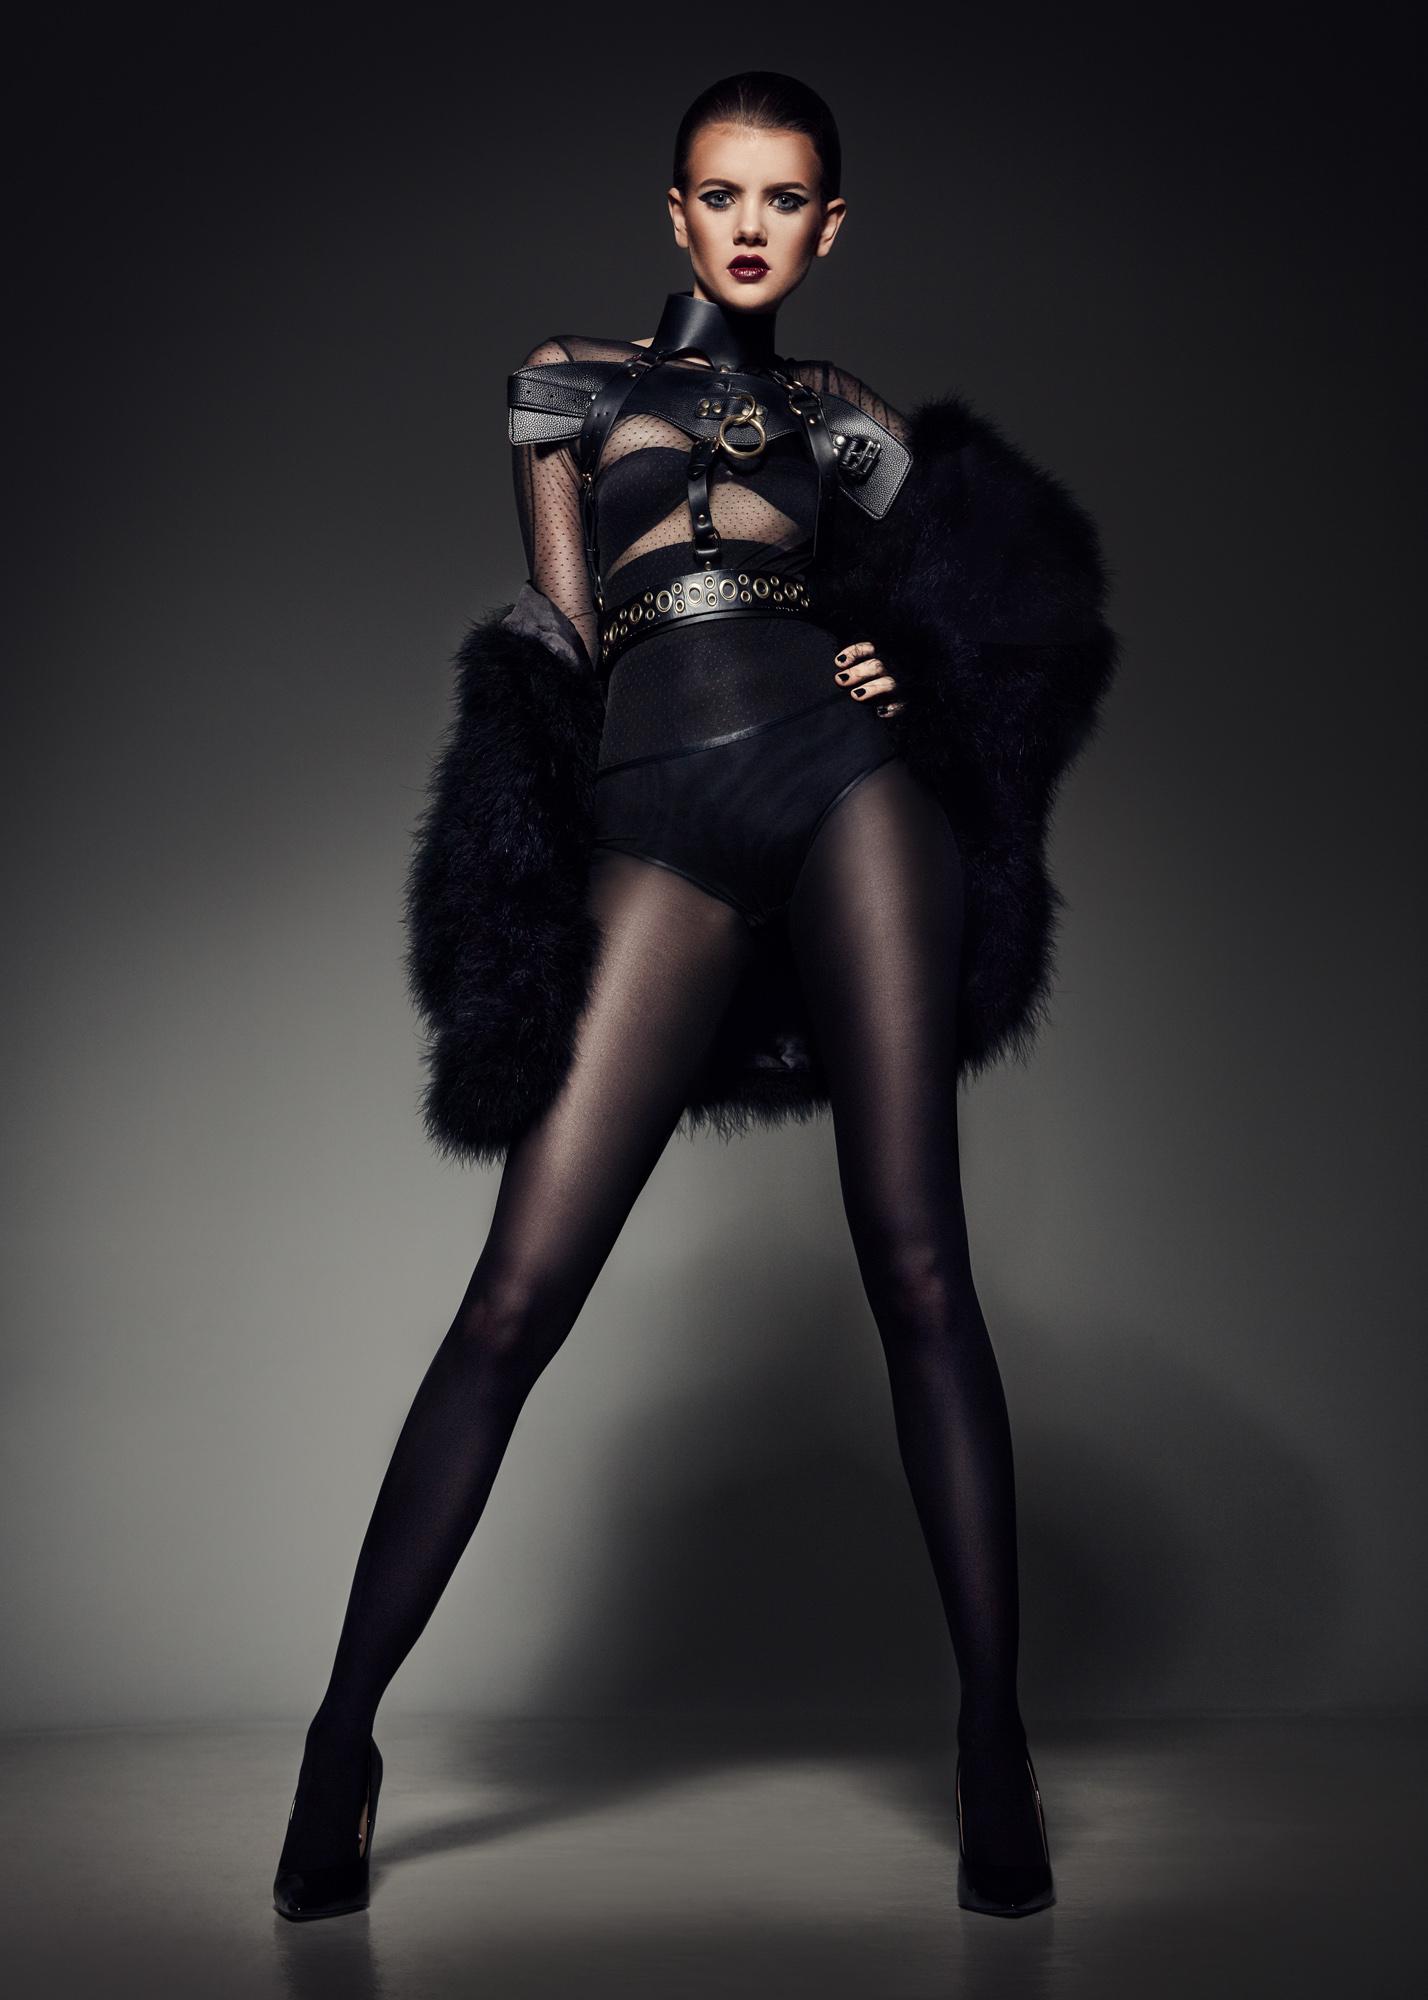 FashionEditorial_AbbieMalone.jpg